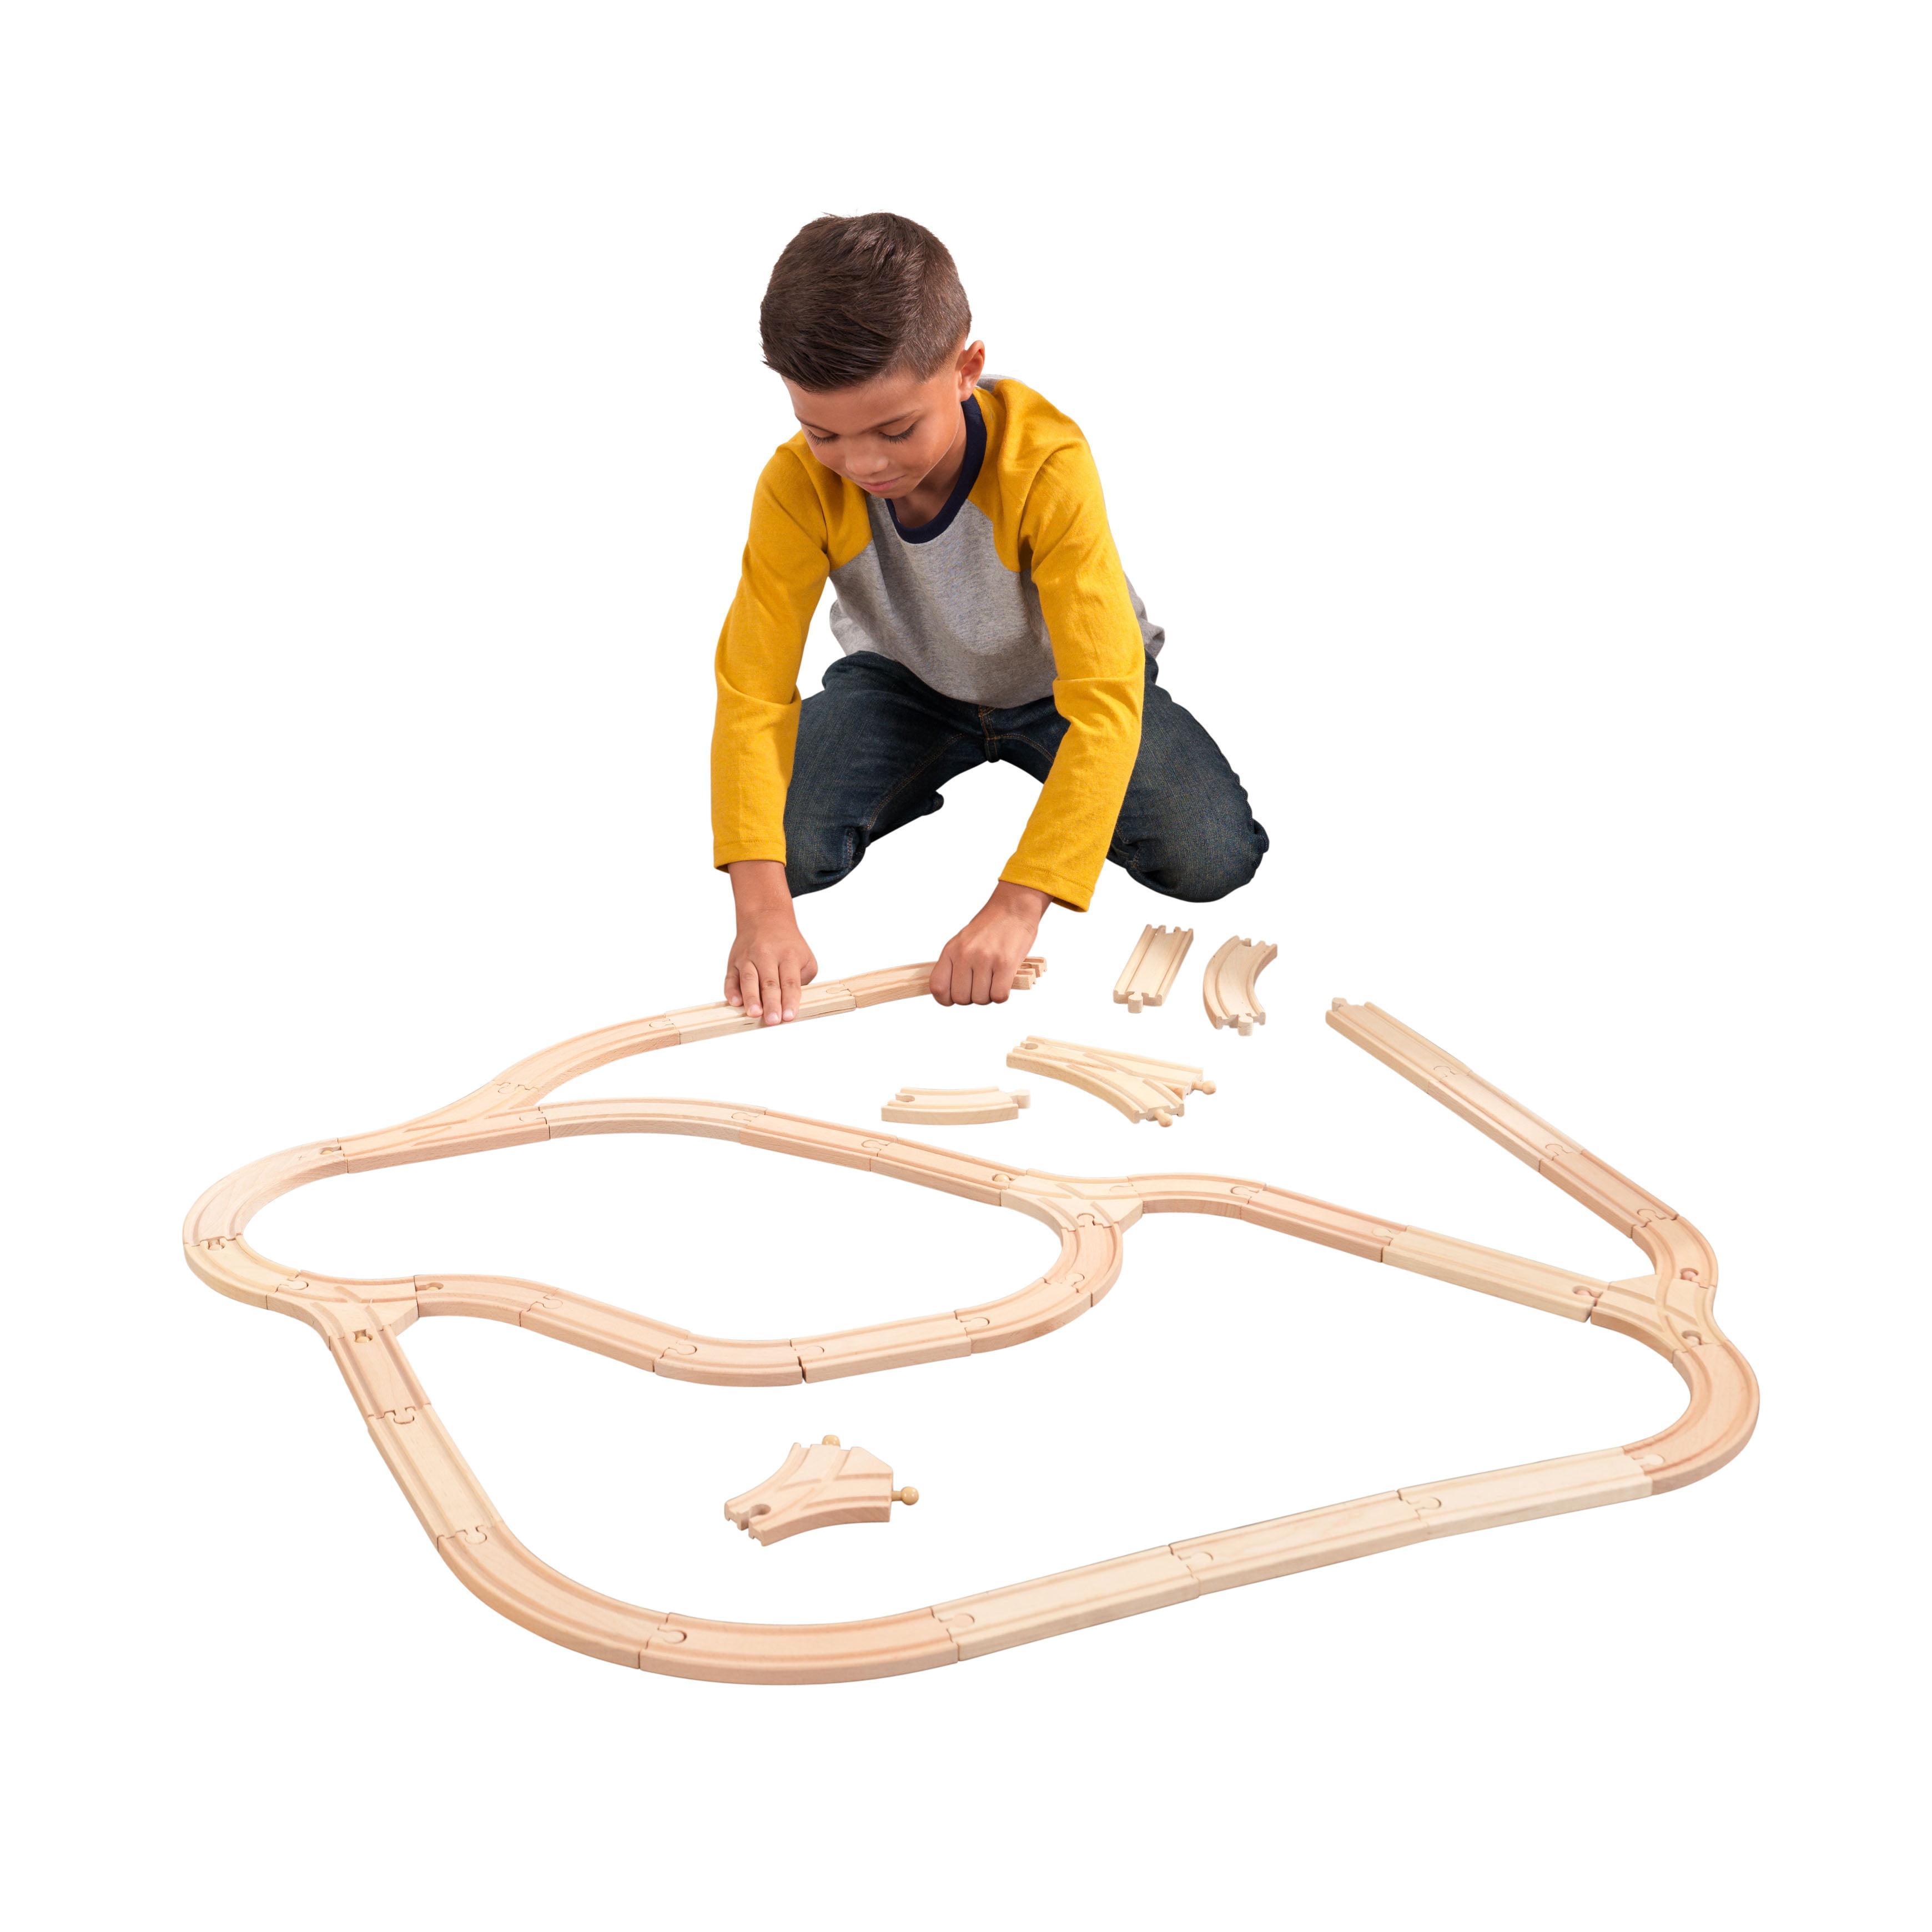 KidKraft Wooden Expansion Track Pack by KidKraft